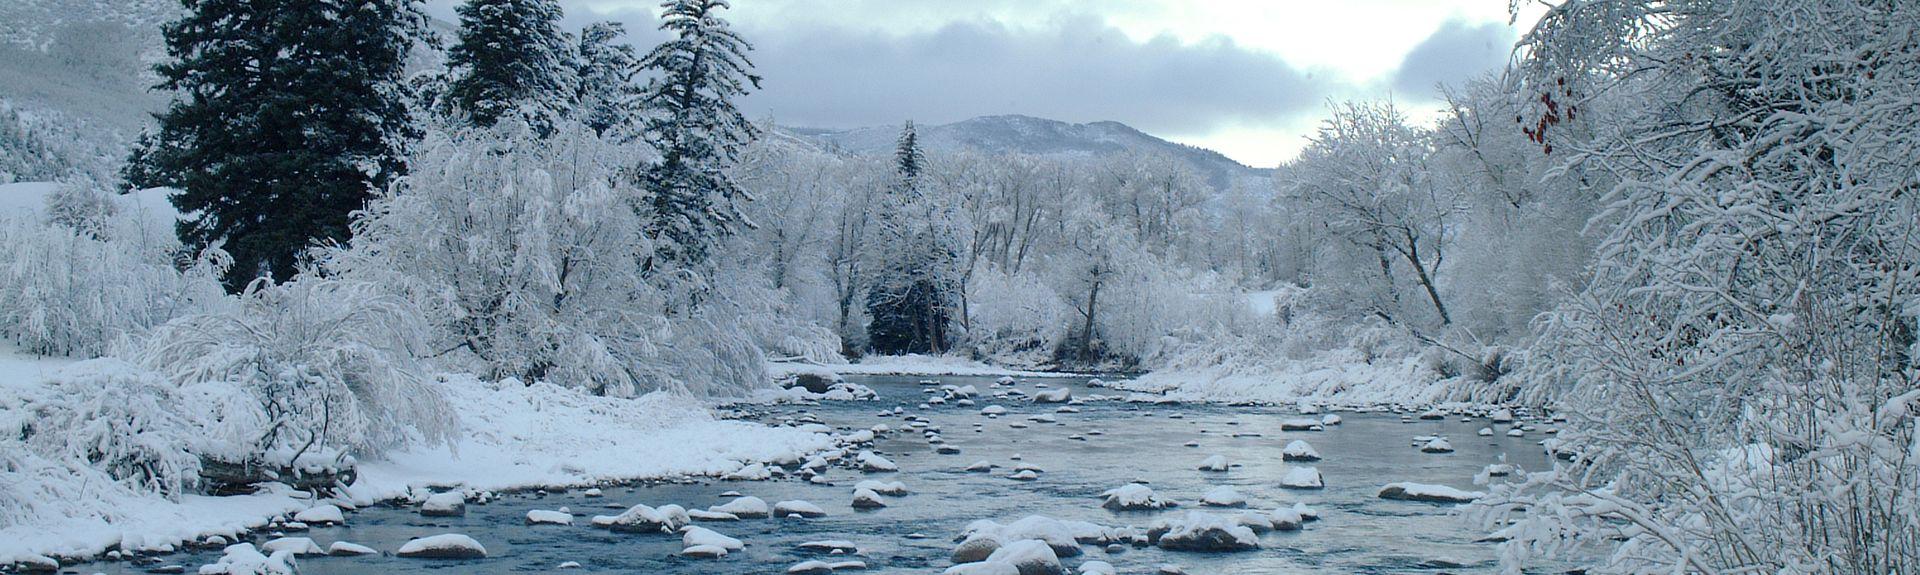 Hyatt Mountain Lodge, Beaver Creek, CO, USA